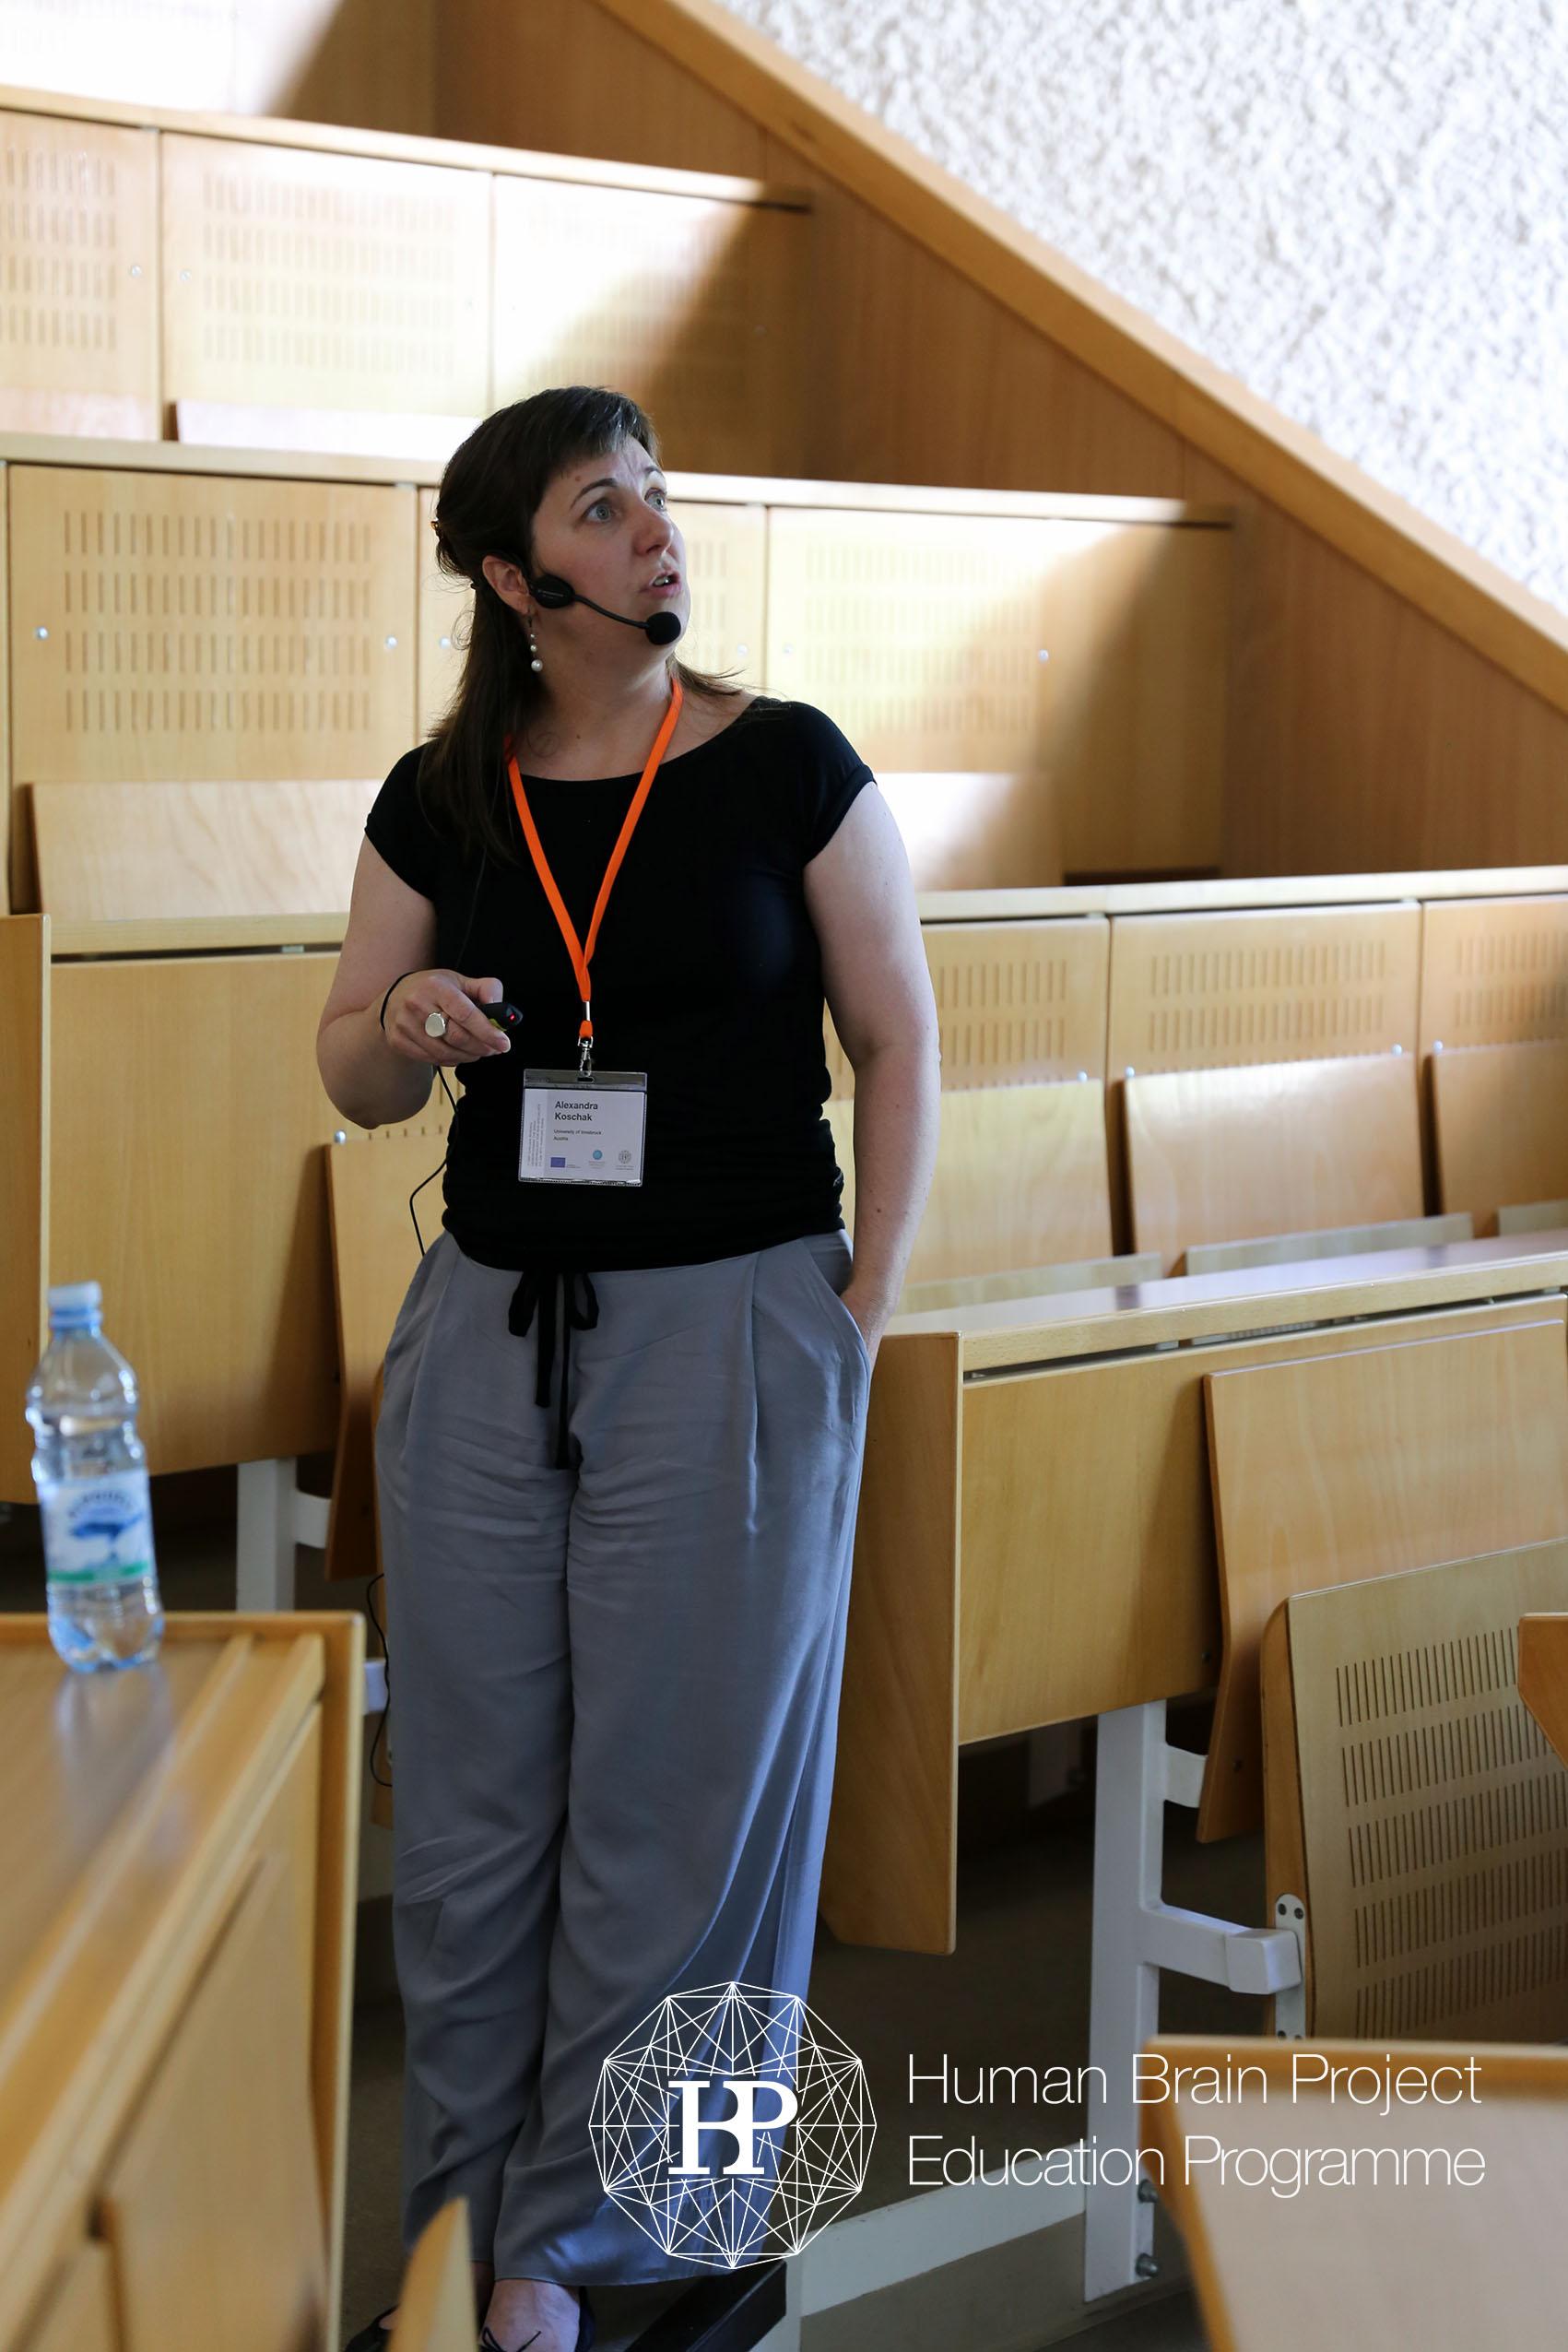 HBP_1st_Neurobiology_workshop_19.jpg -